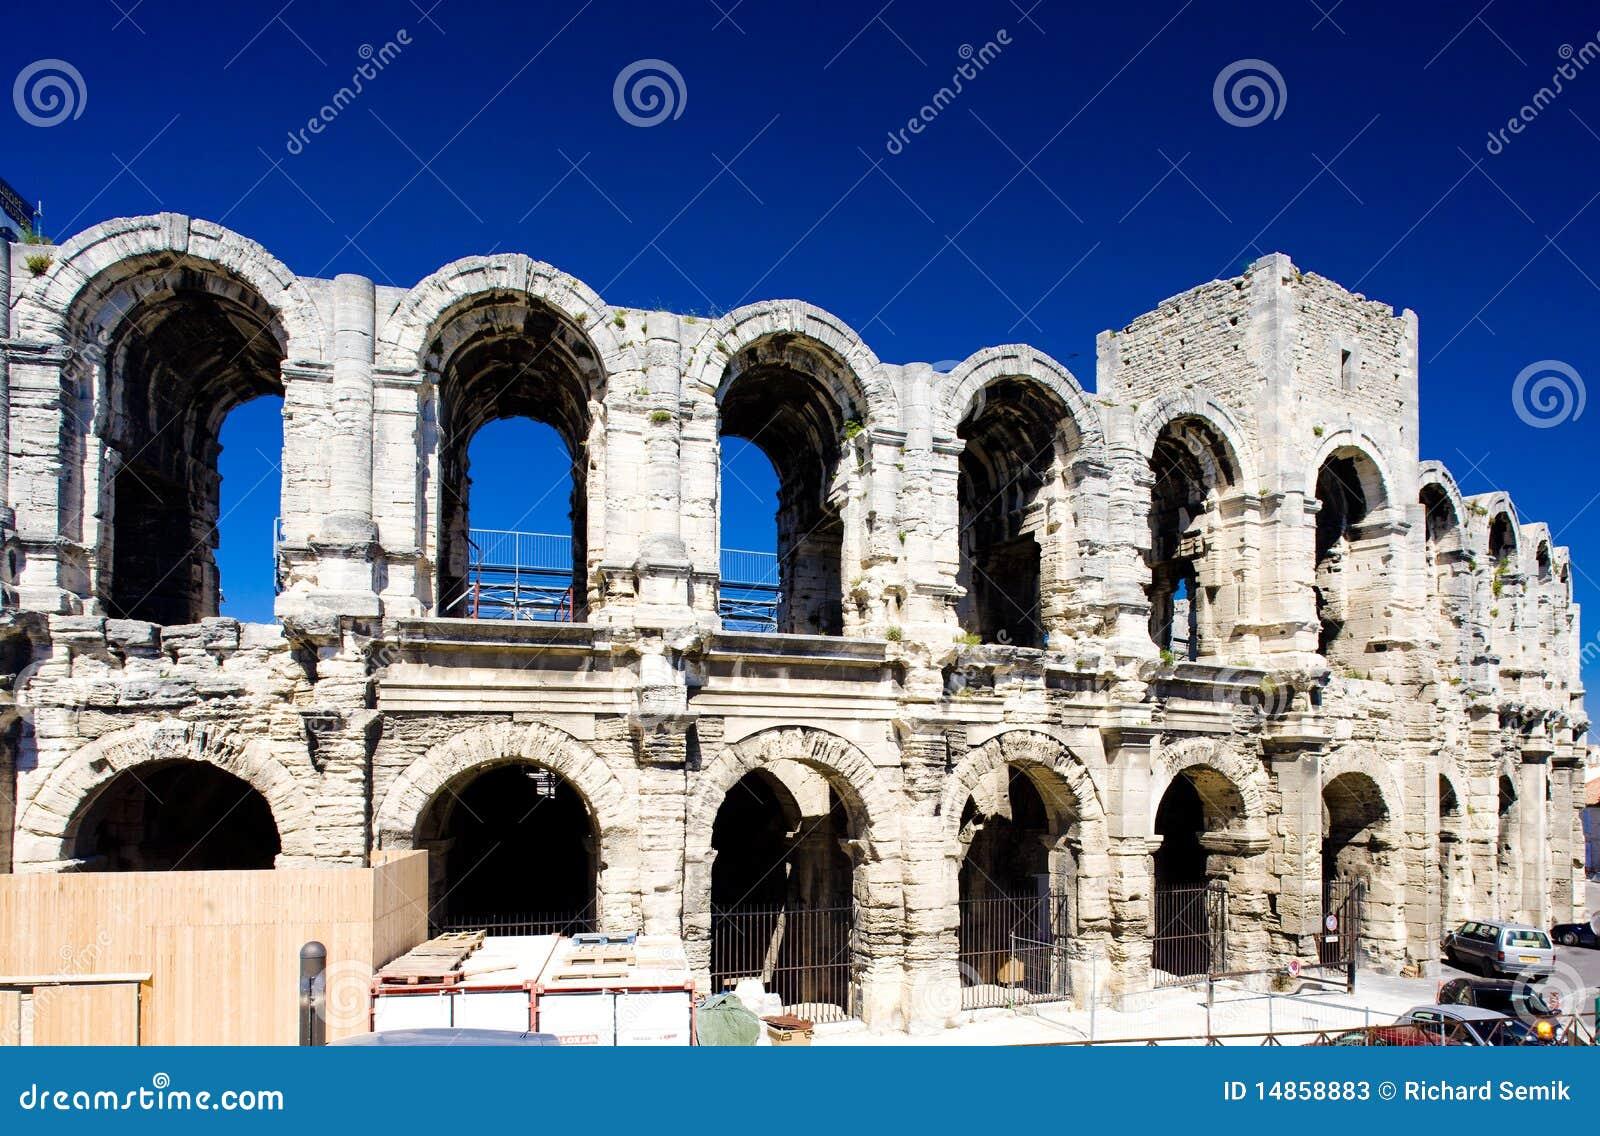 City of Arles